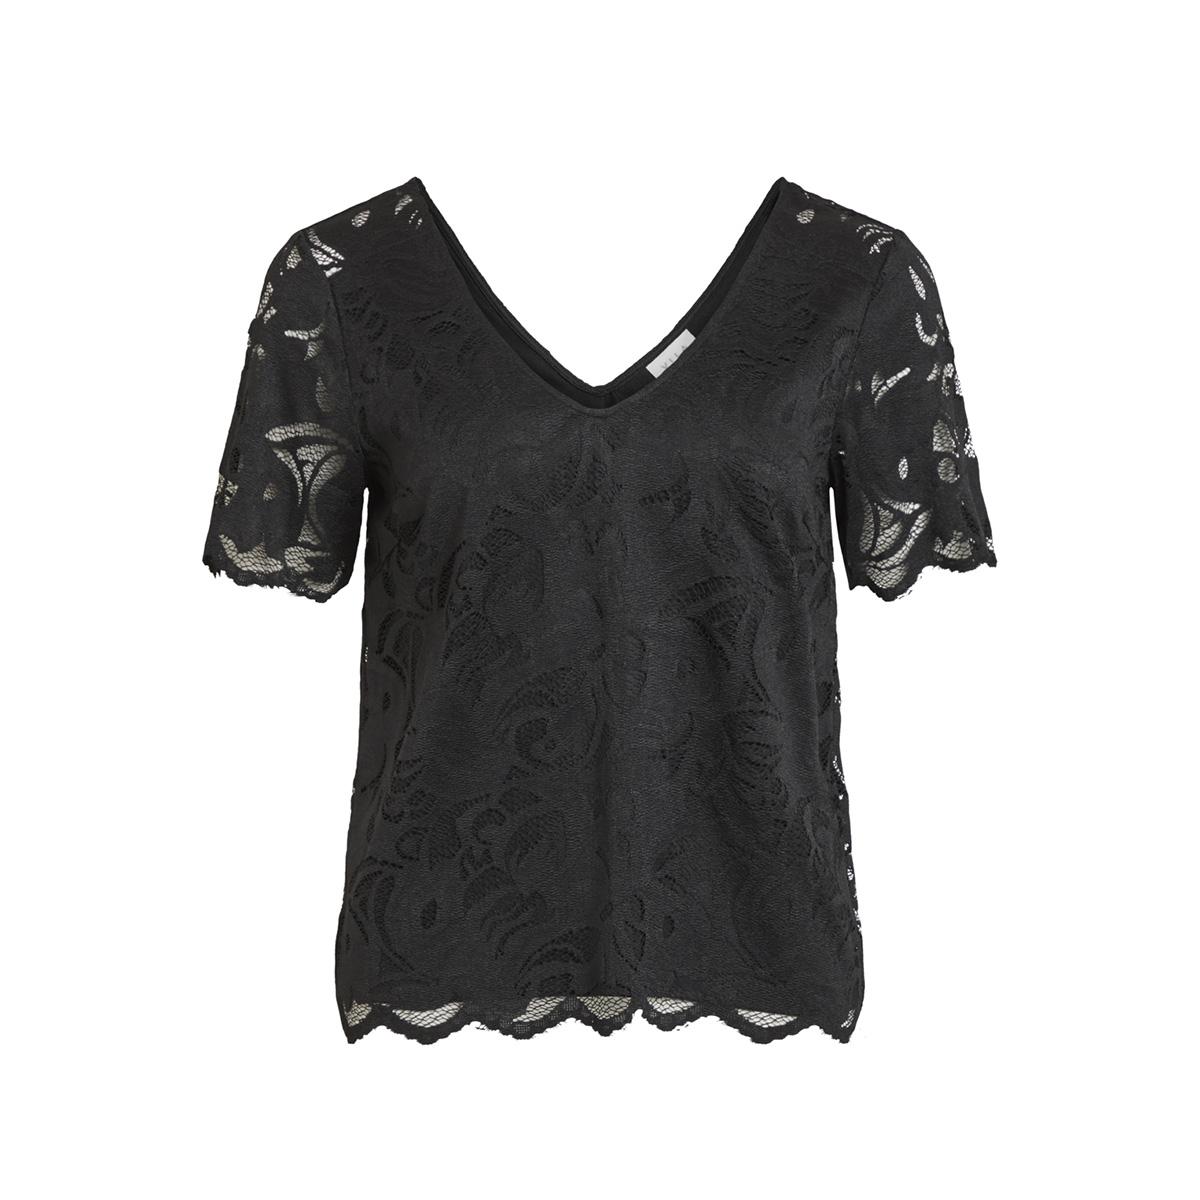 vidaimy s/s t-shirt tb 14051848 vila t-shirt black